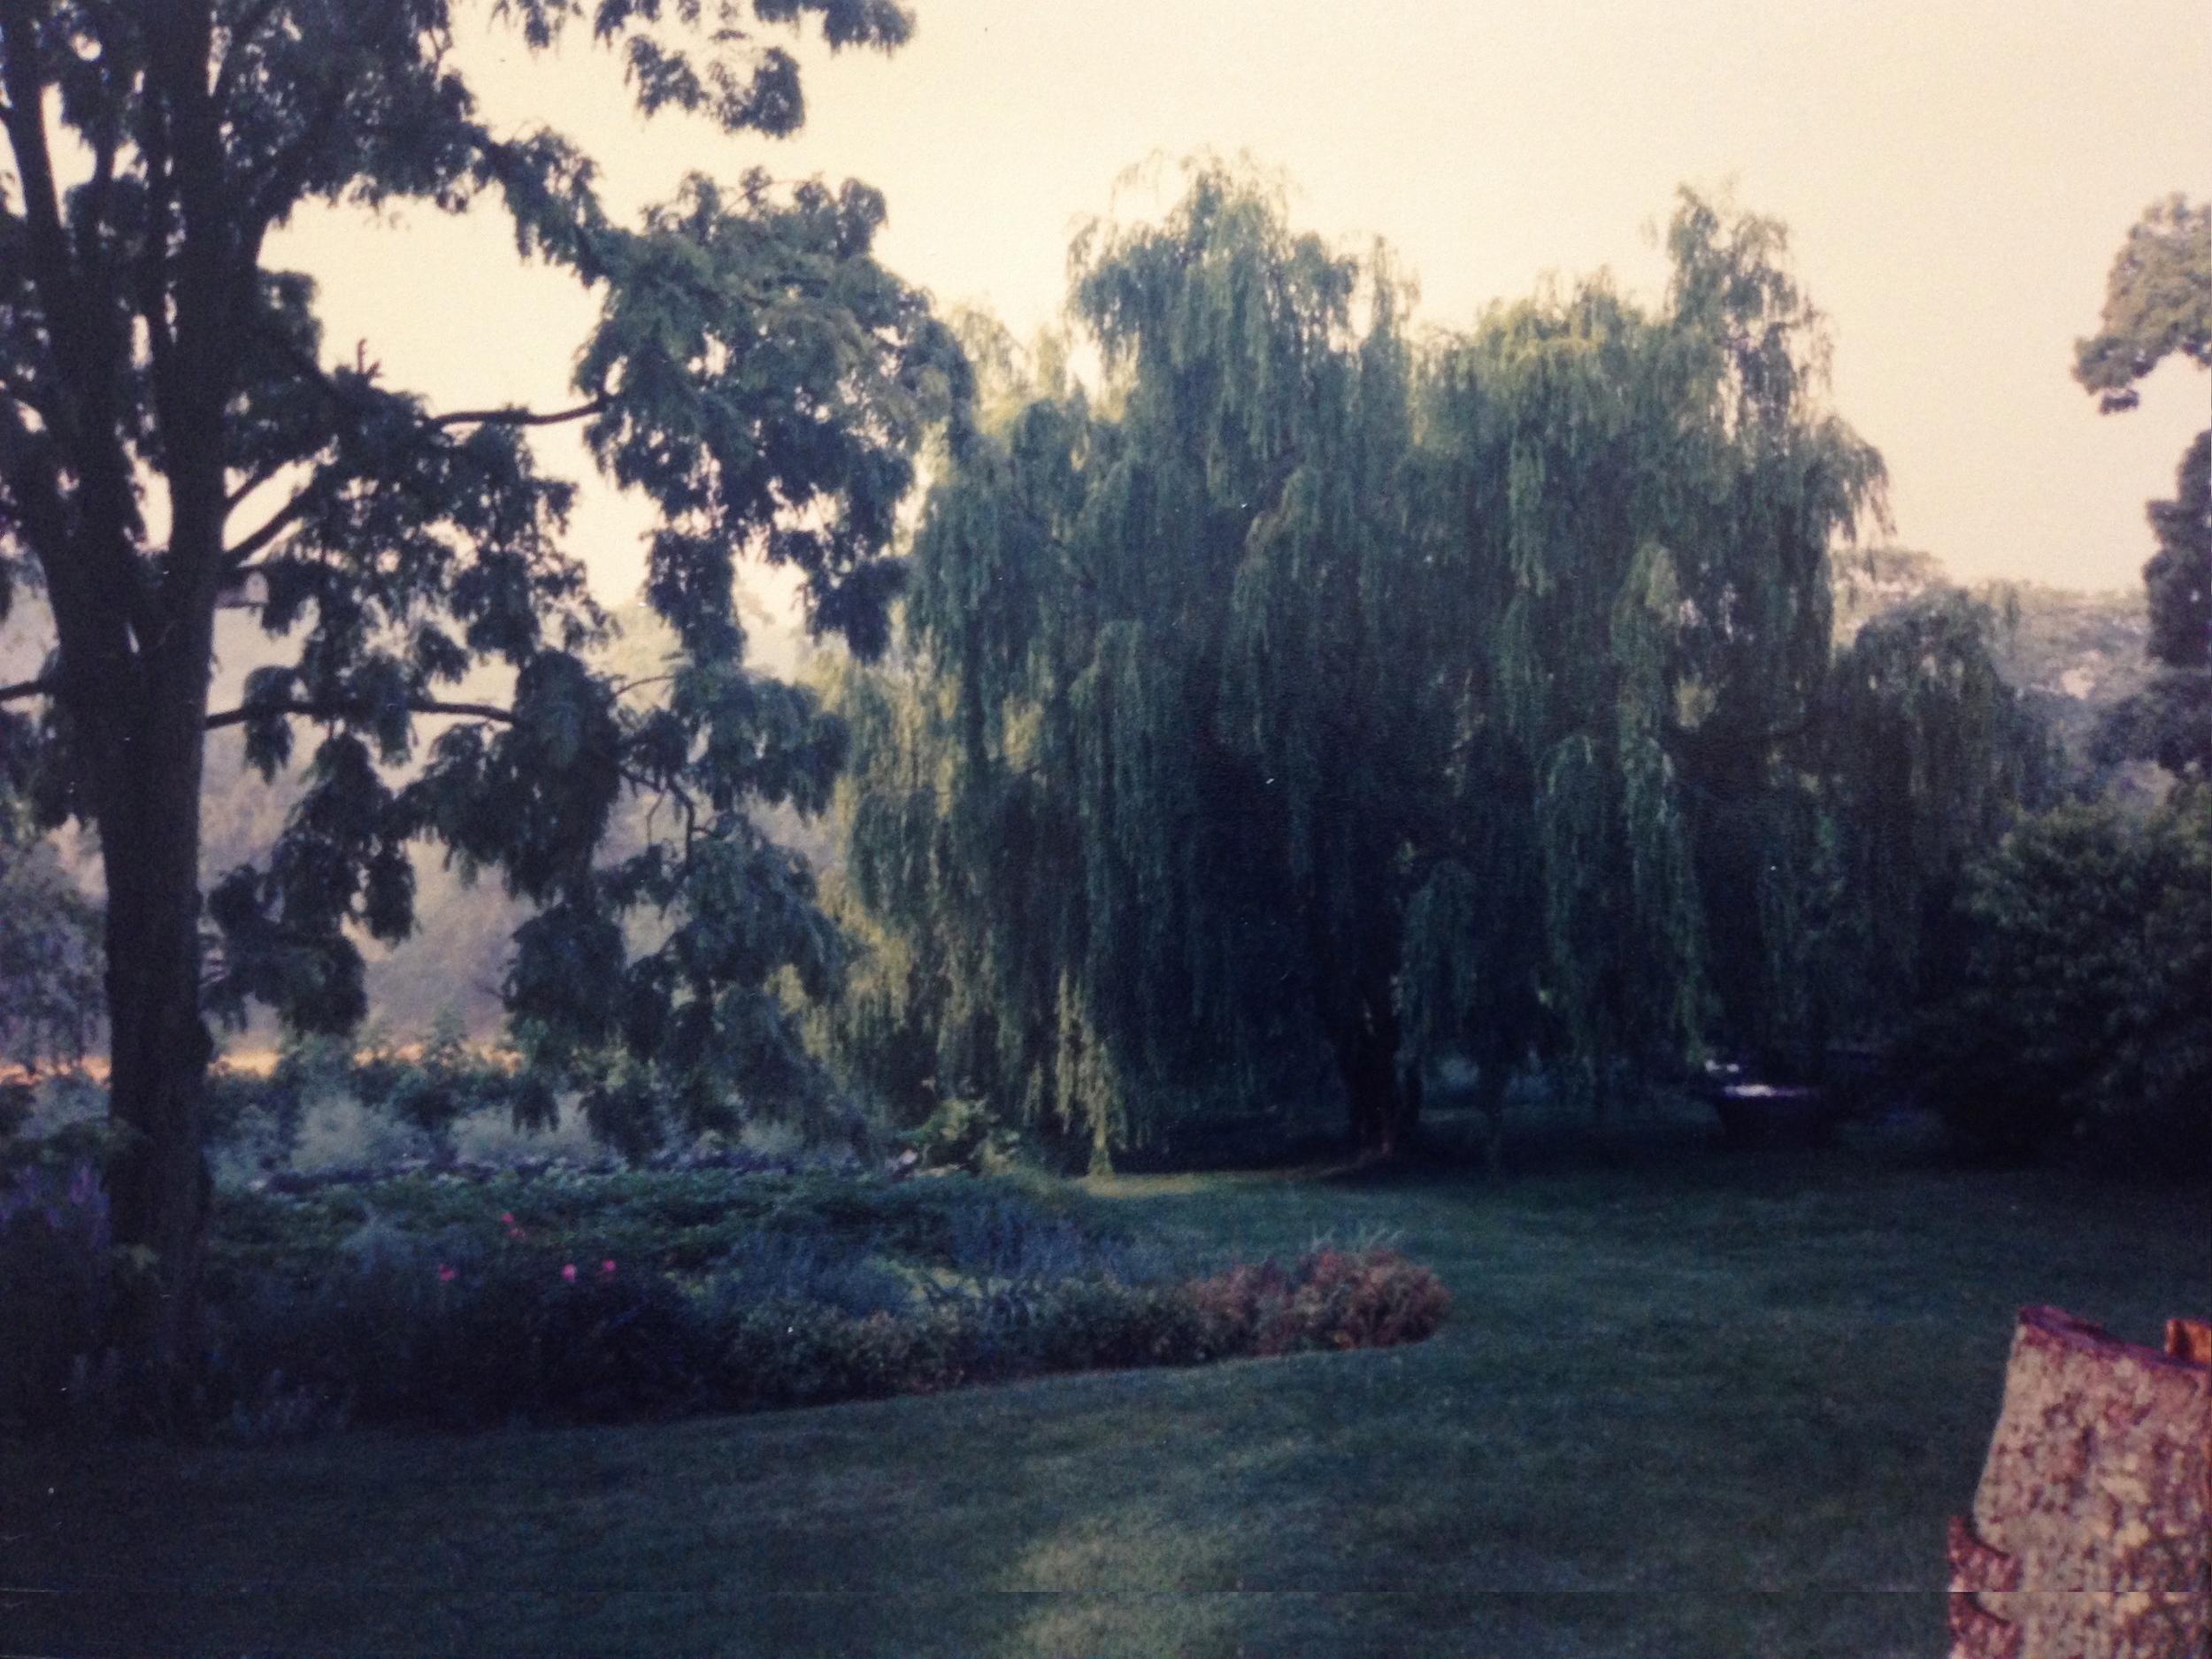 the garden & weeping willow